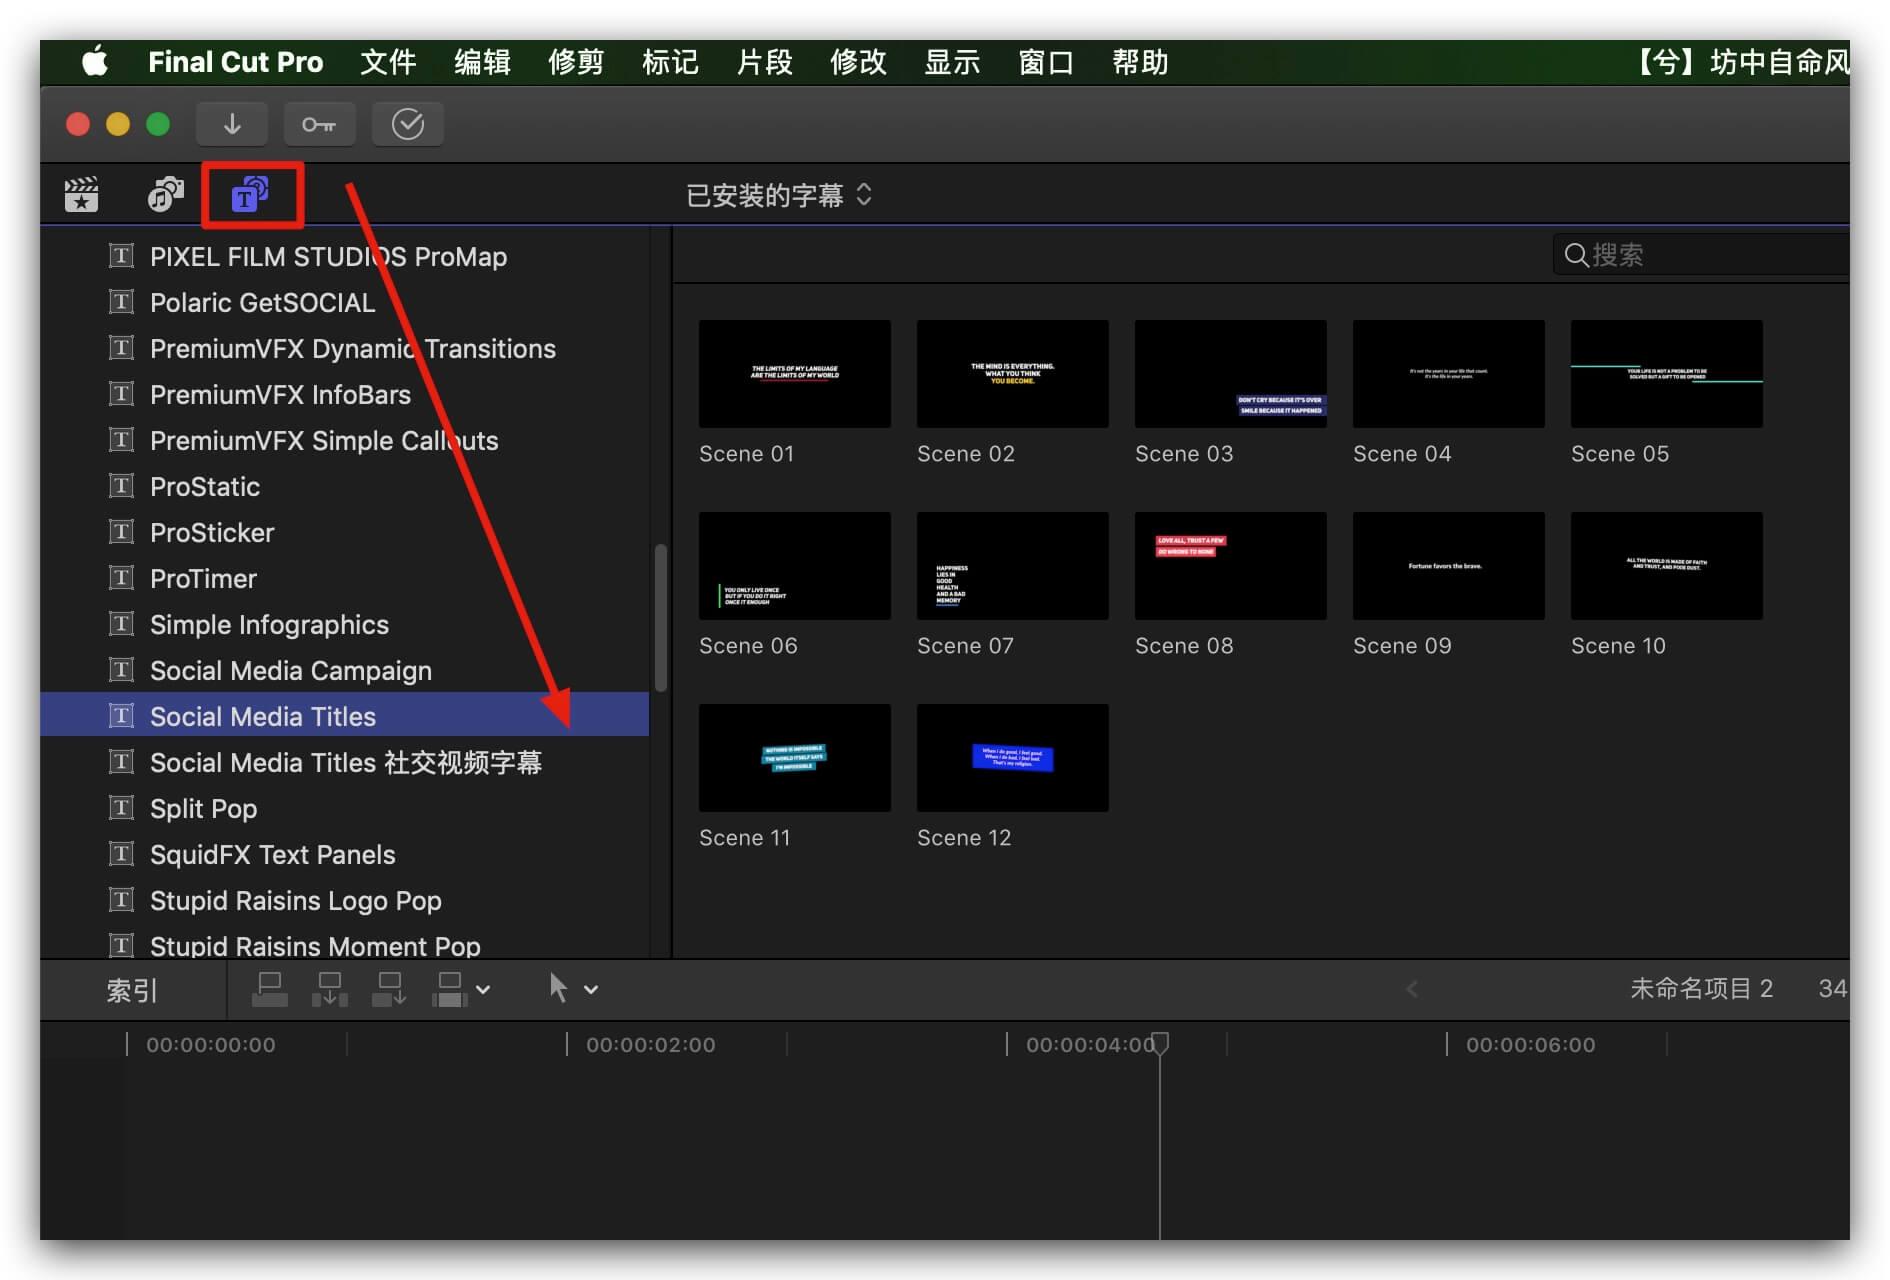 Fcpx插件 12组社交自媒体标题模板 Vlog动态封面字幕 Social Media Titles